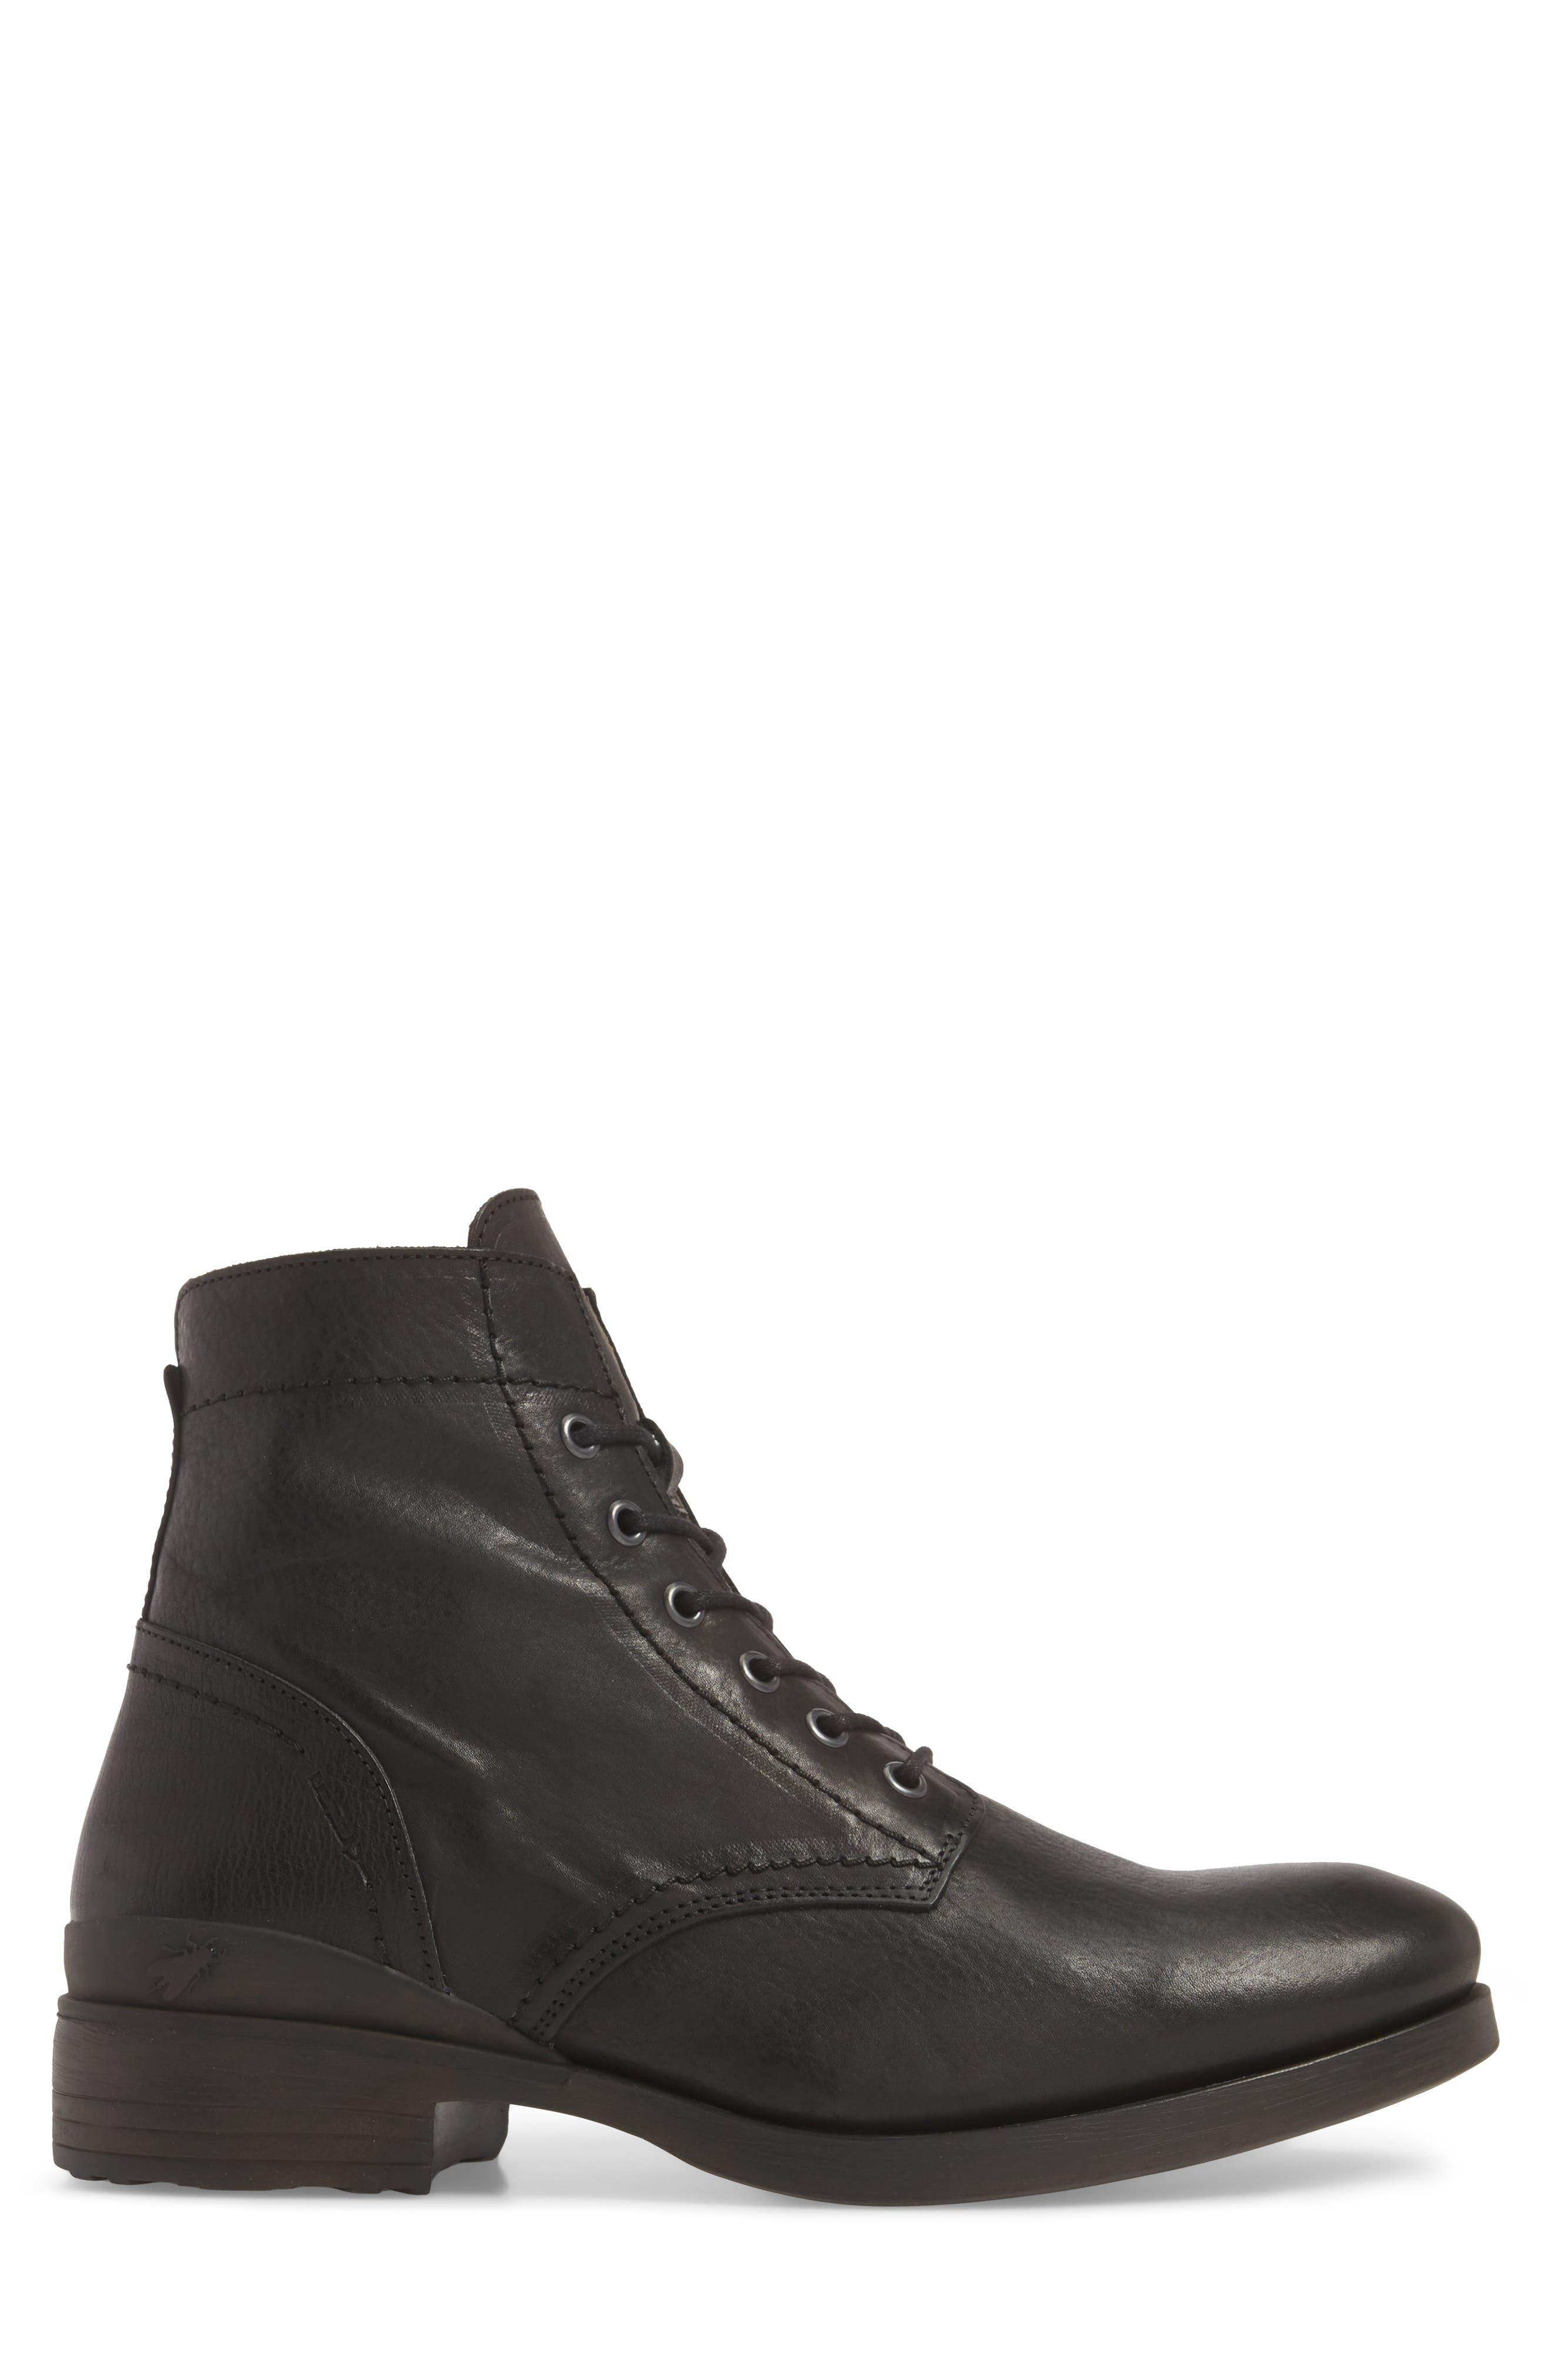 Marc Combat Boot,                             Alternate thumbnail 3, color,                             BLACK APSO